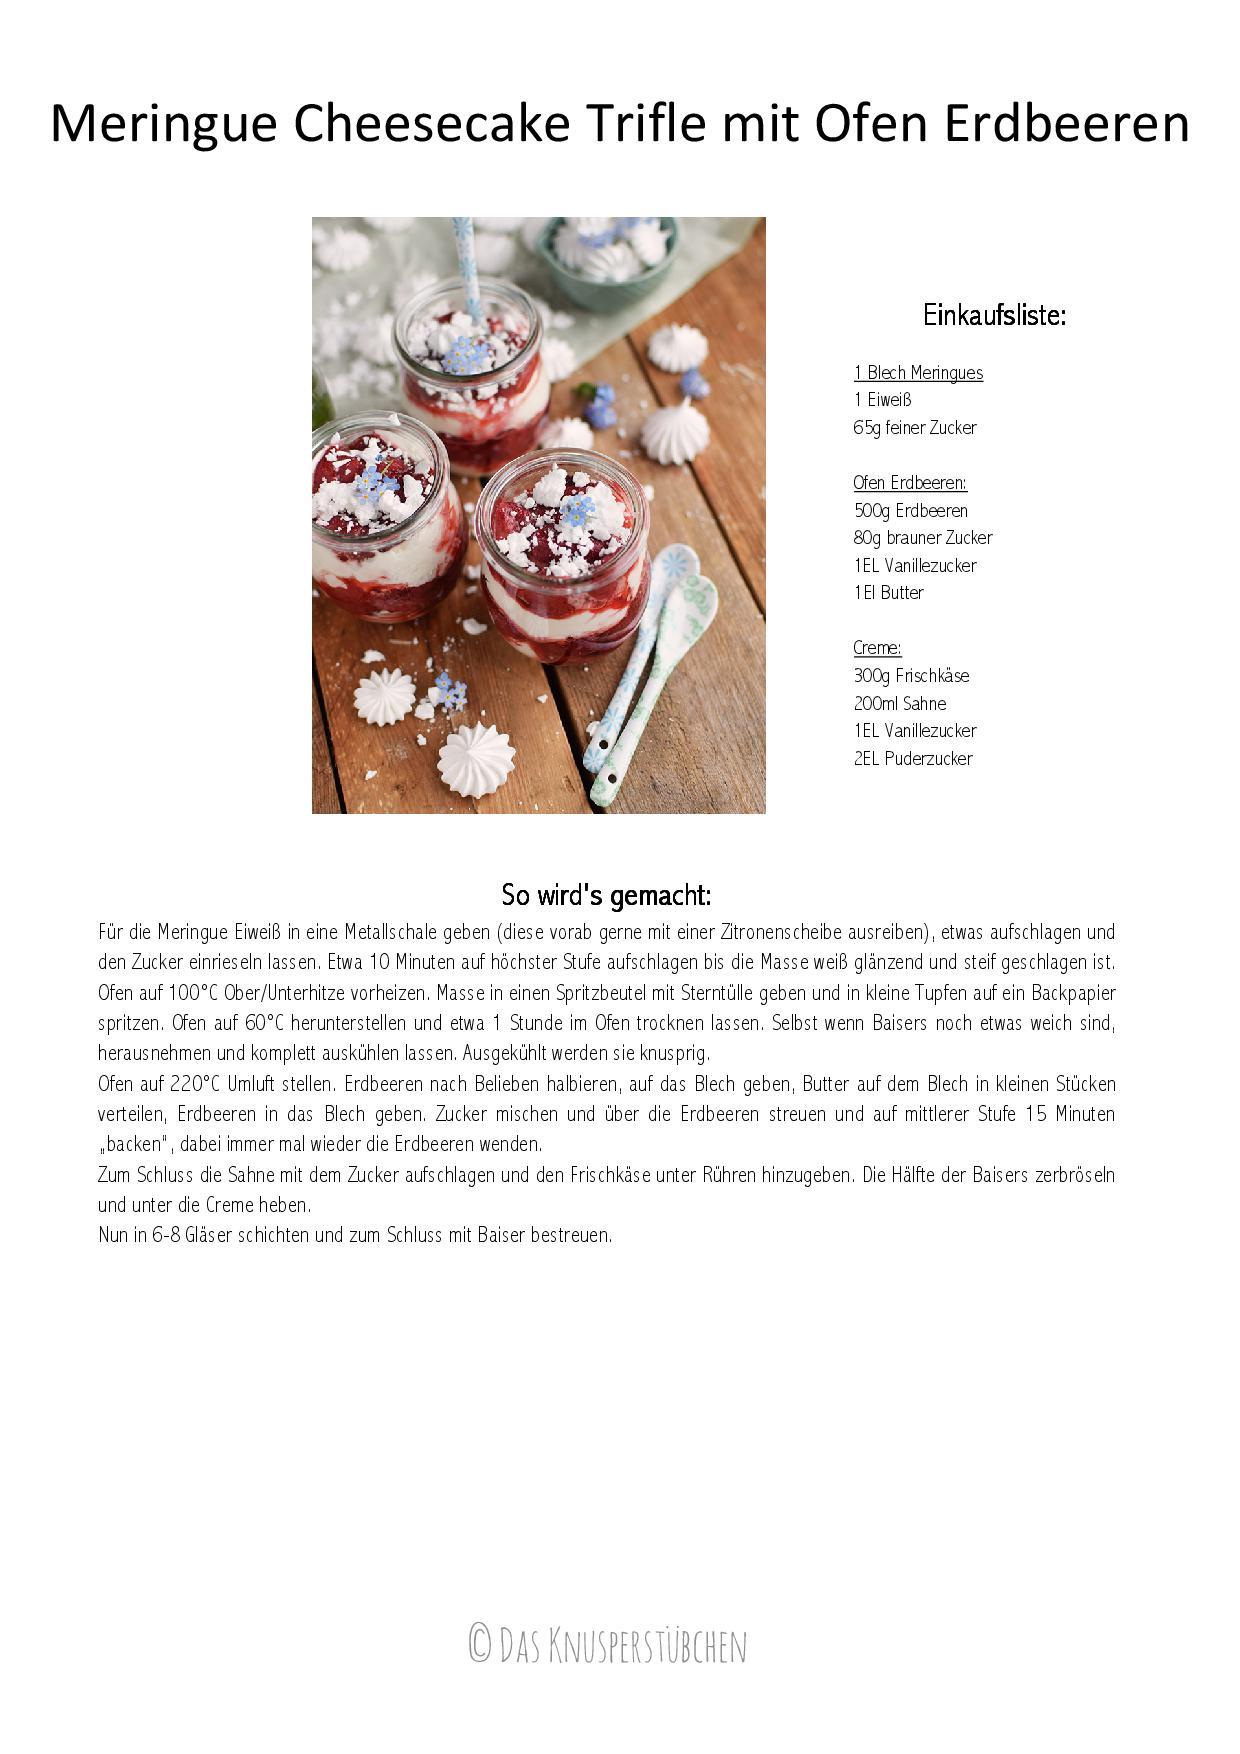 Meringue Cheesecake Trifle mit Ofen Erdbeeren-001